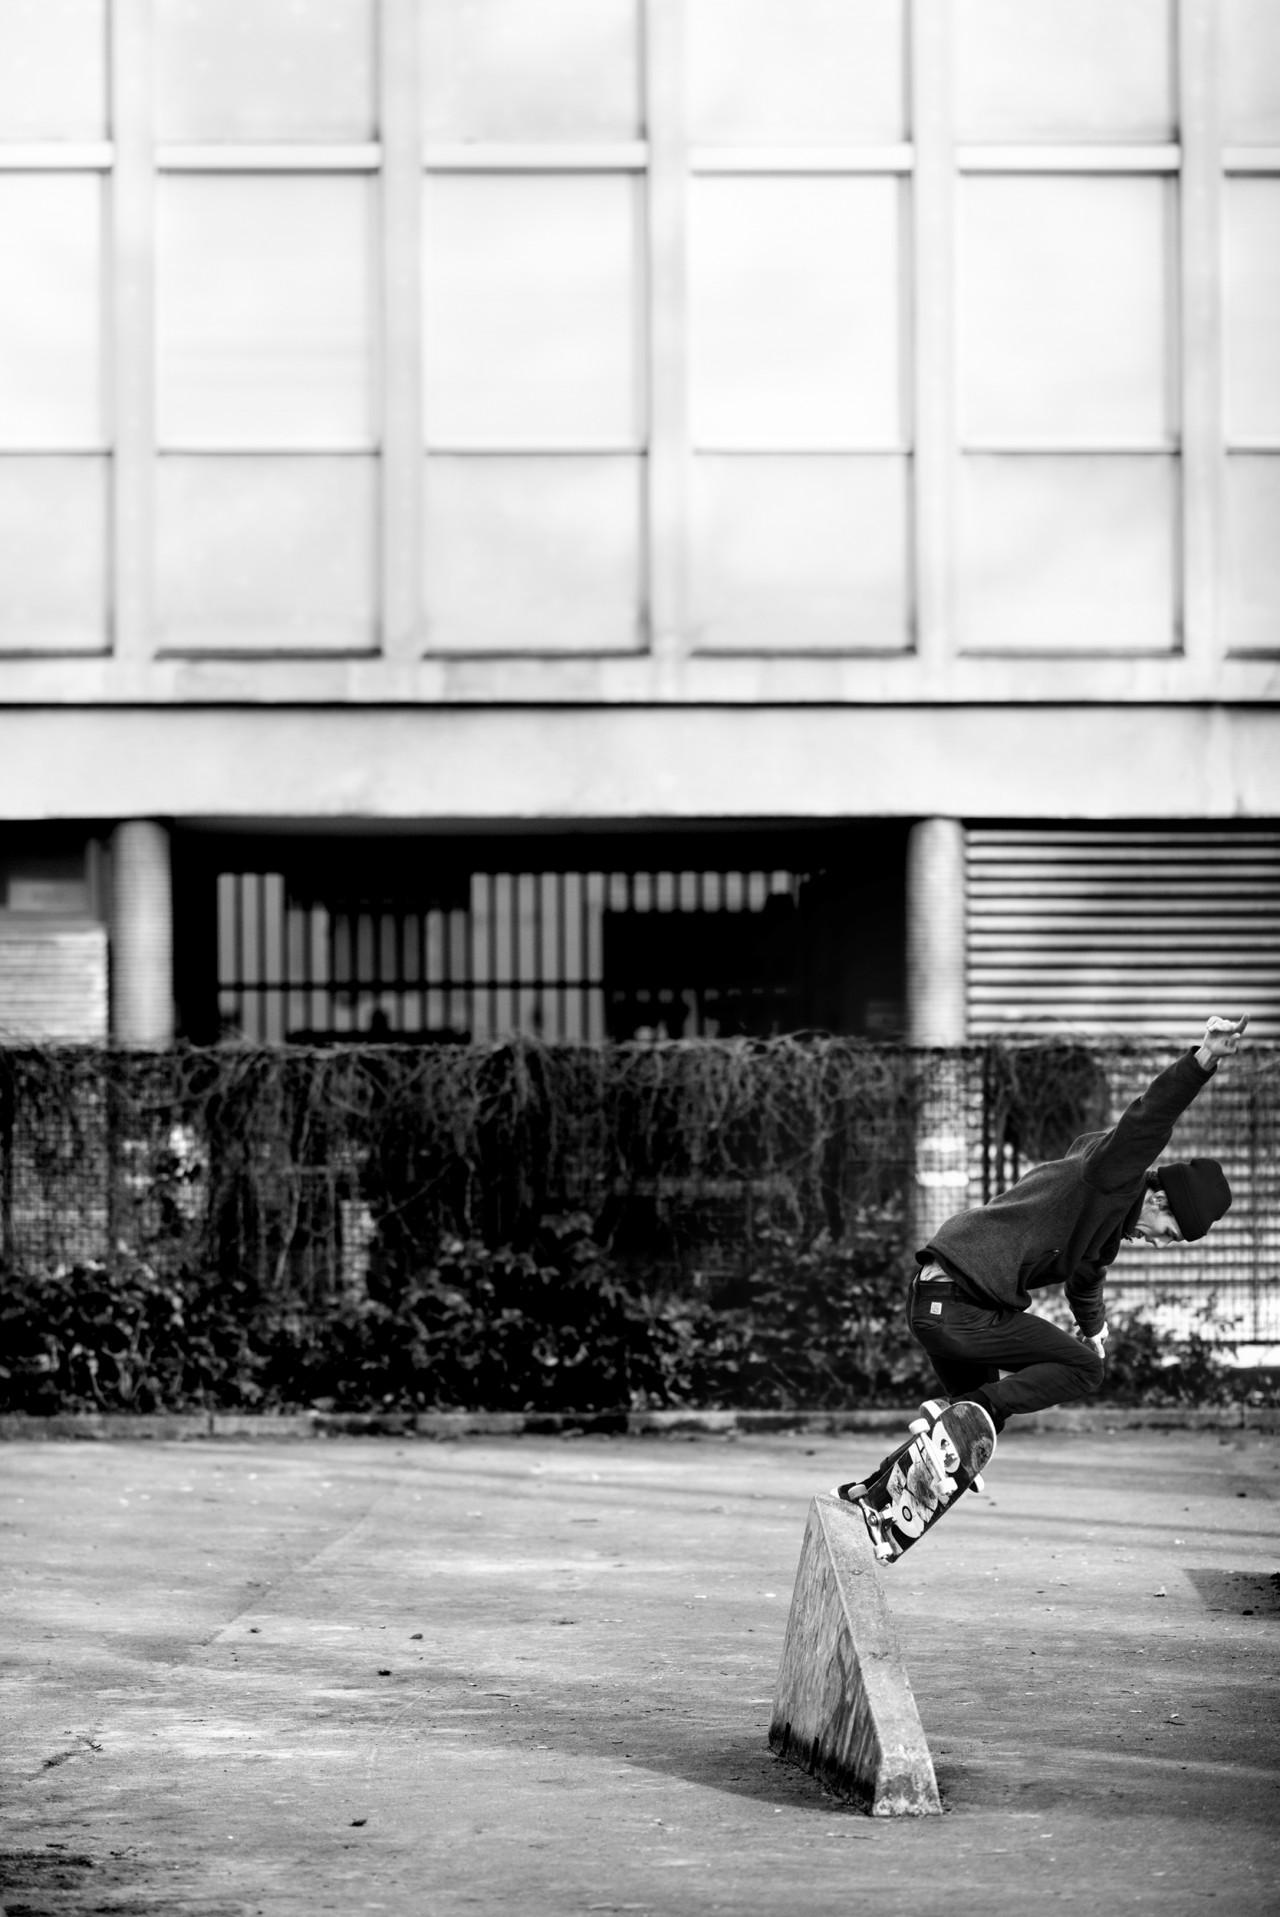 Biemer skateboarding